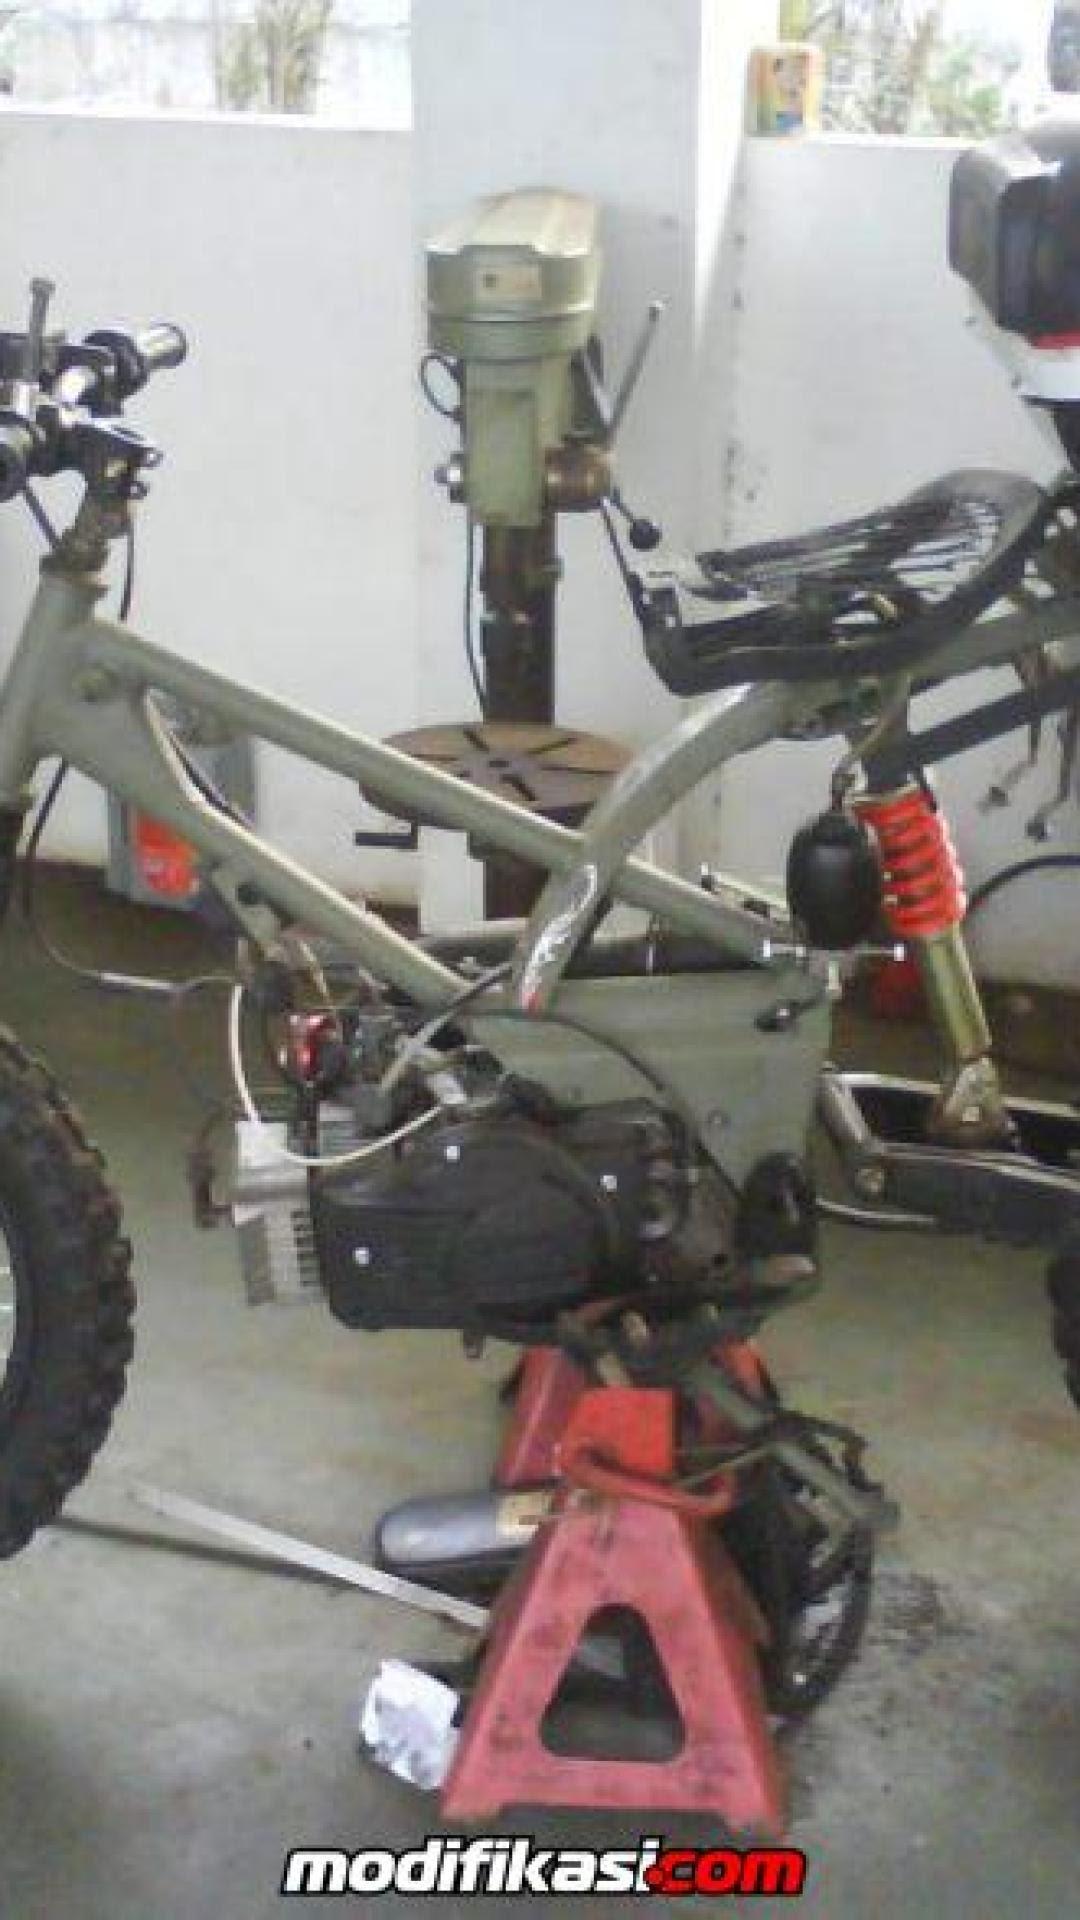 Modifikasi Rc 100 : modifikasi, Modifikasi, Motor, Suzuki, Bravo, Terbaik, Terupdate, Togog, Modif